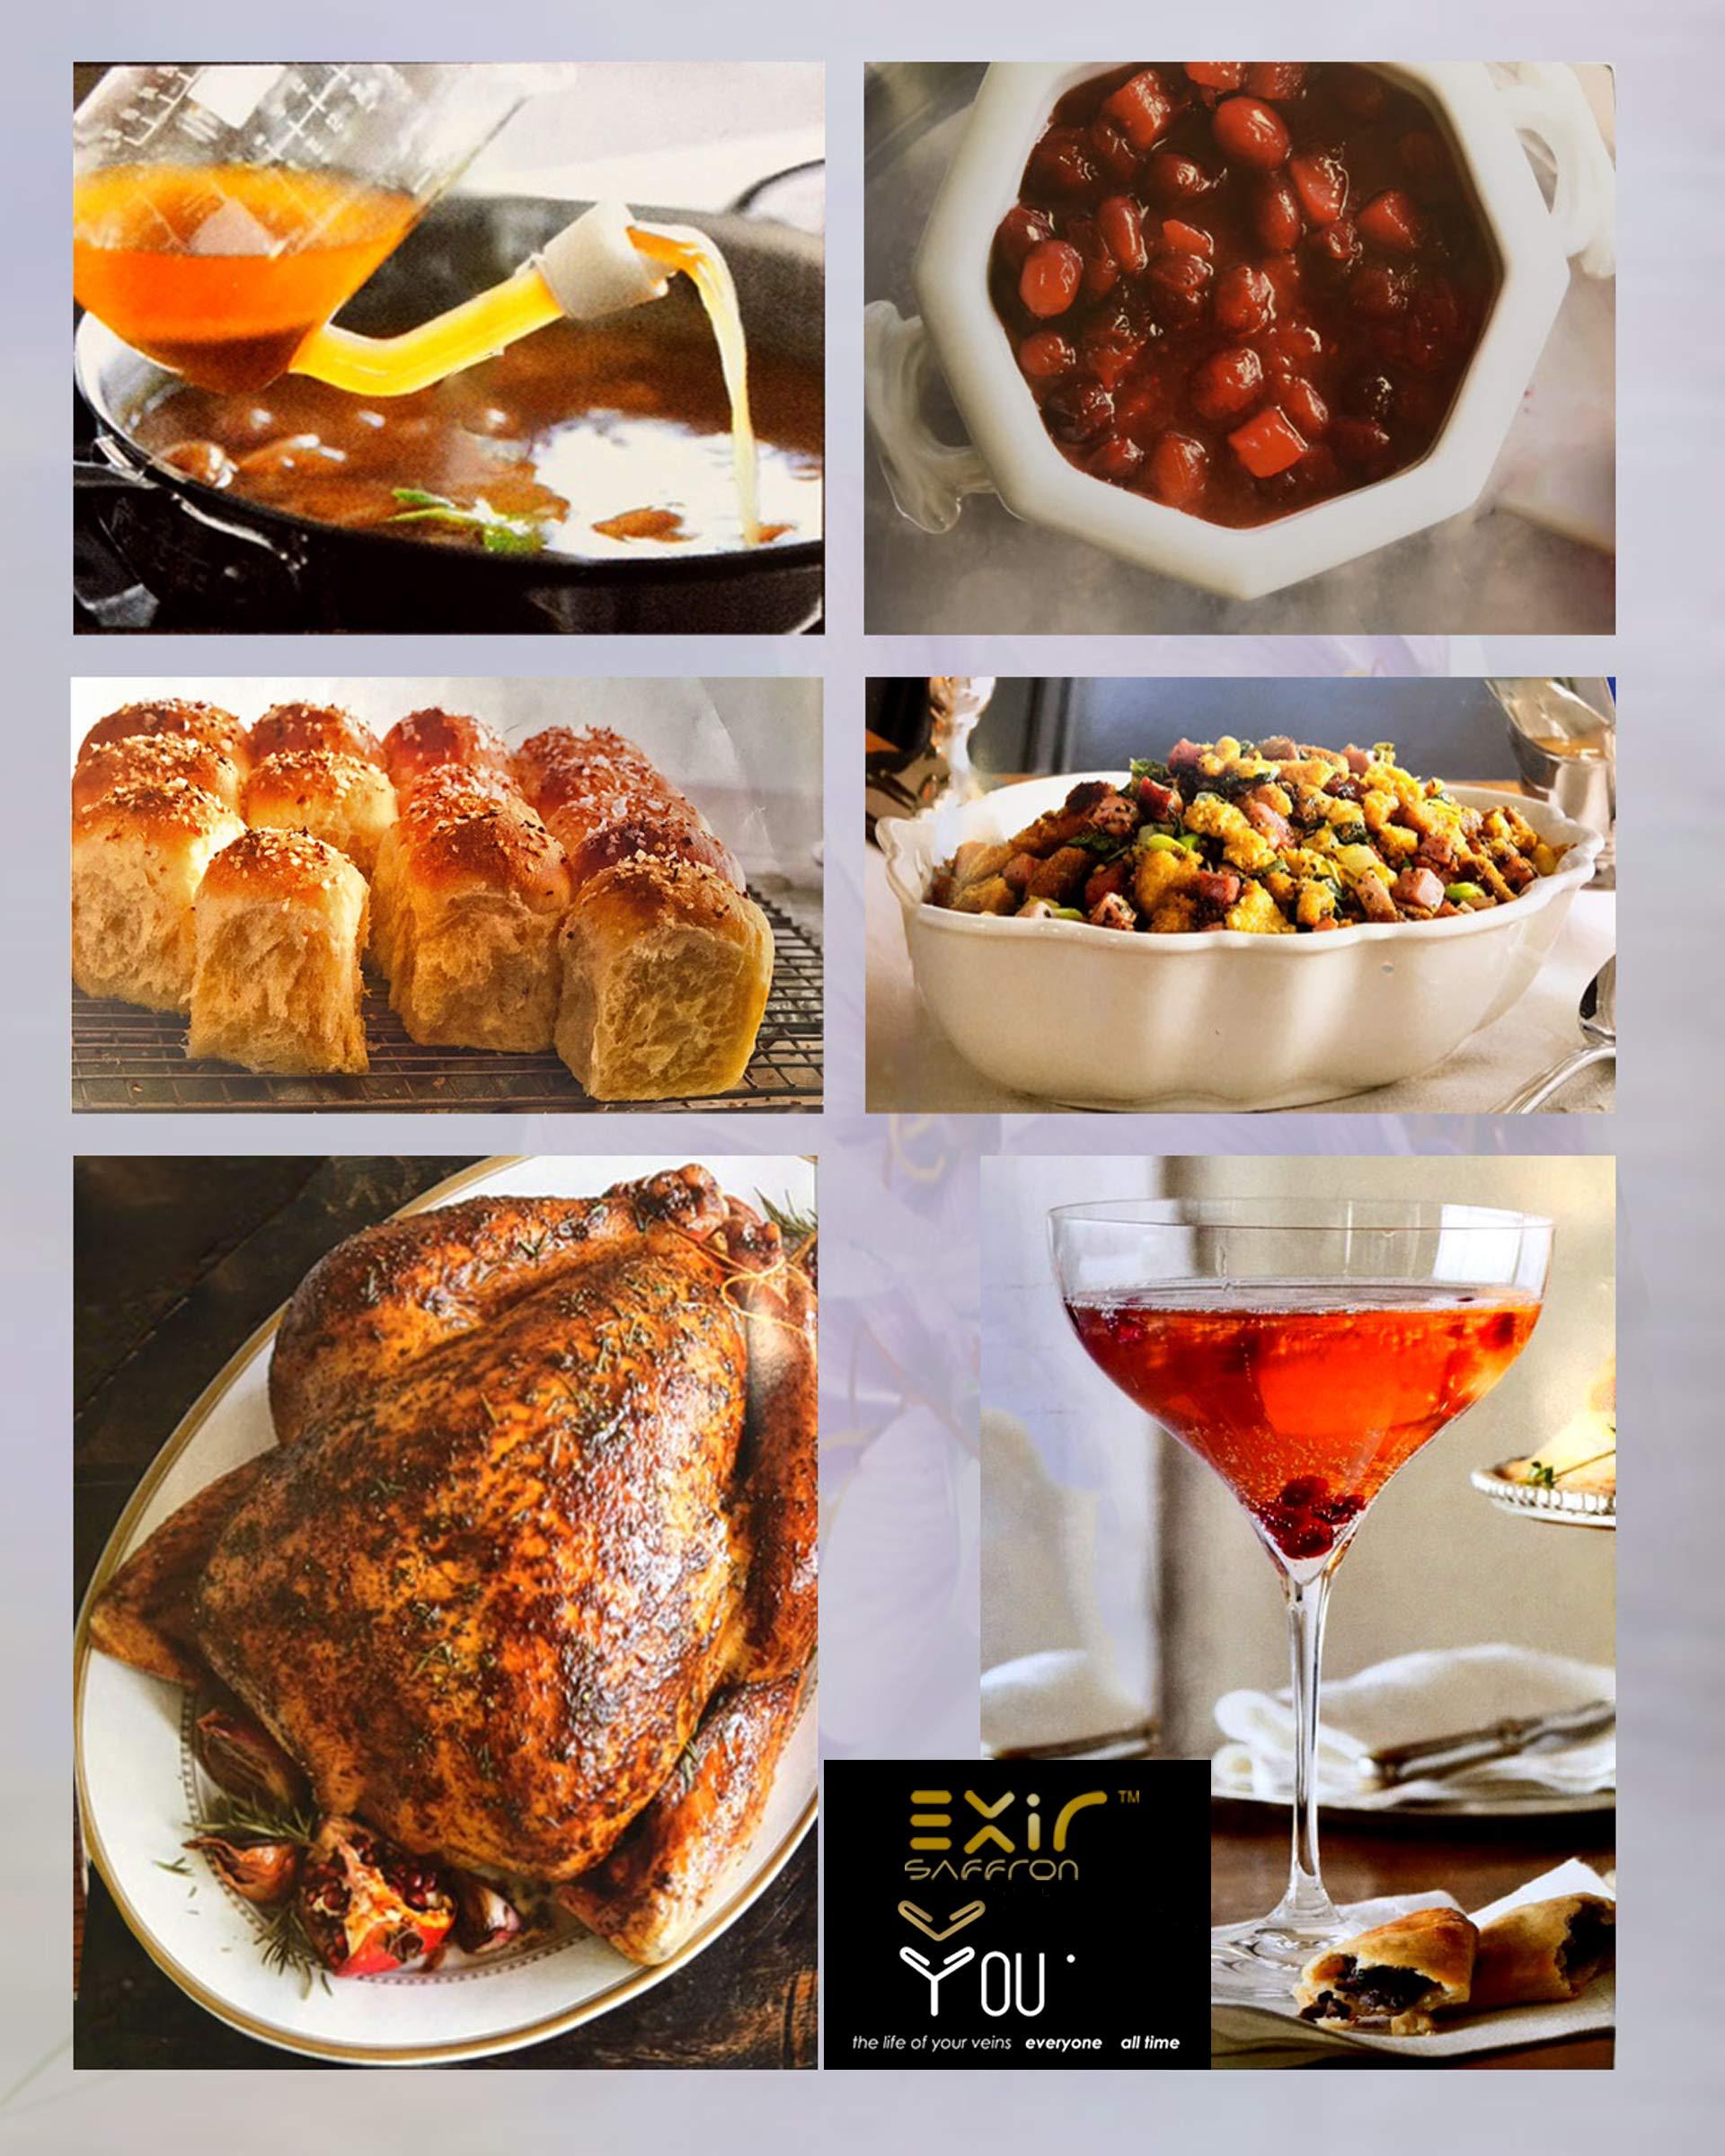 Exir Saffron Powdered (10-grams) - Sprinkle Herb and Spice Seasoning by EXIR (Image #3)